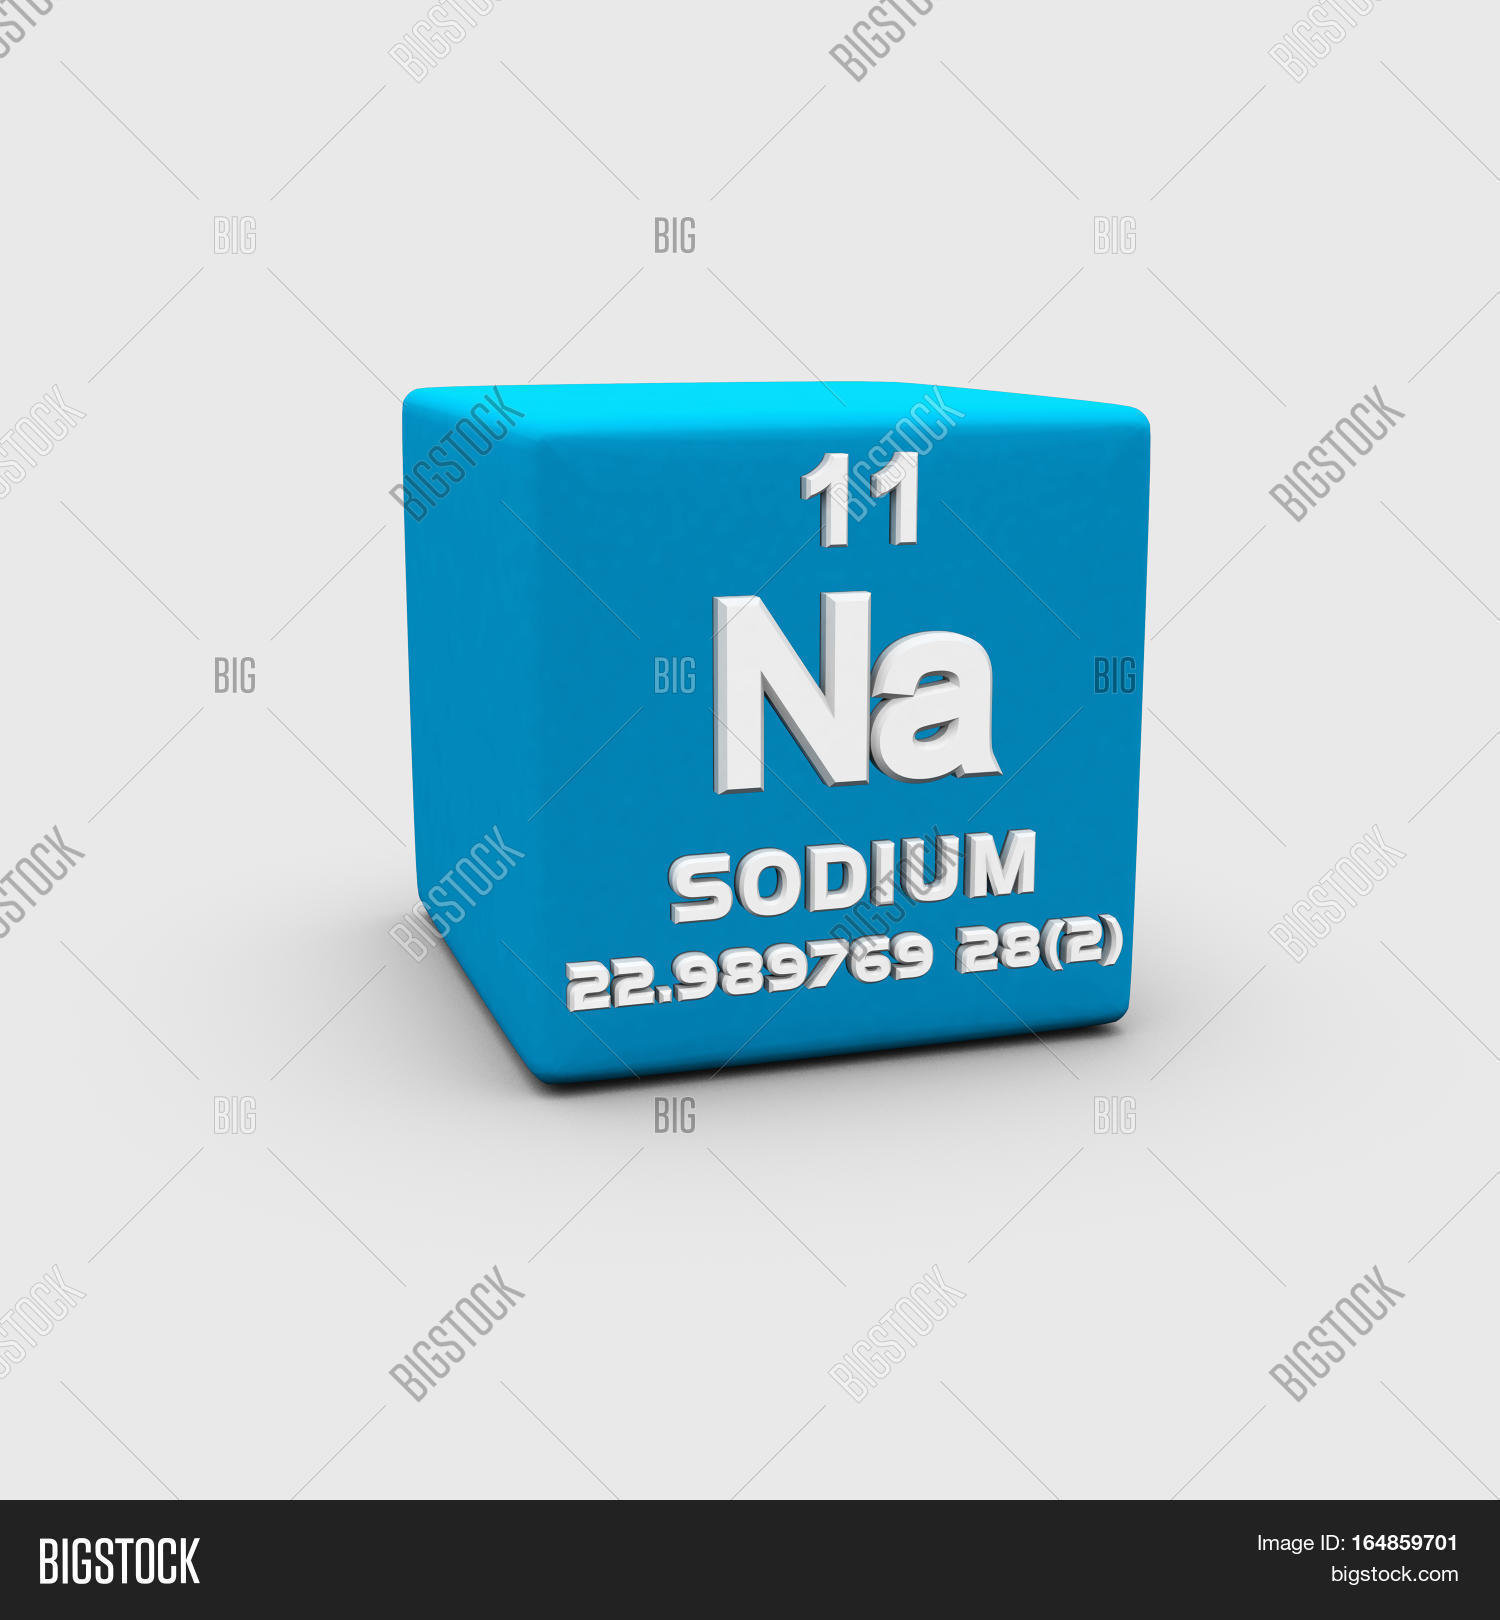 Sodium Chemical Image Photo Free Trial Bigstock